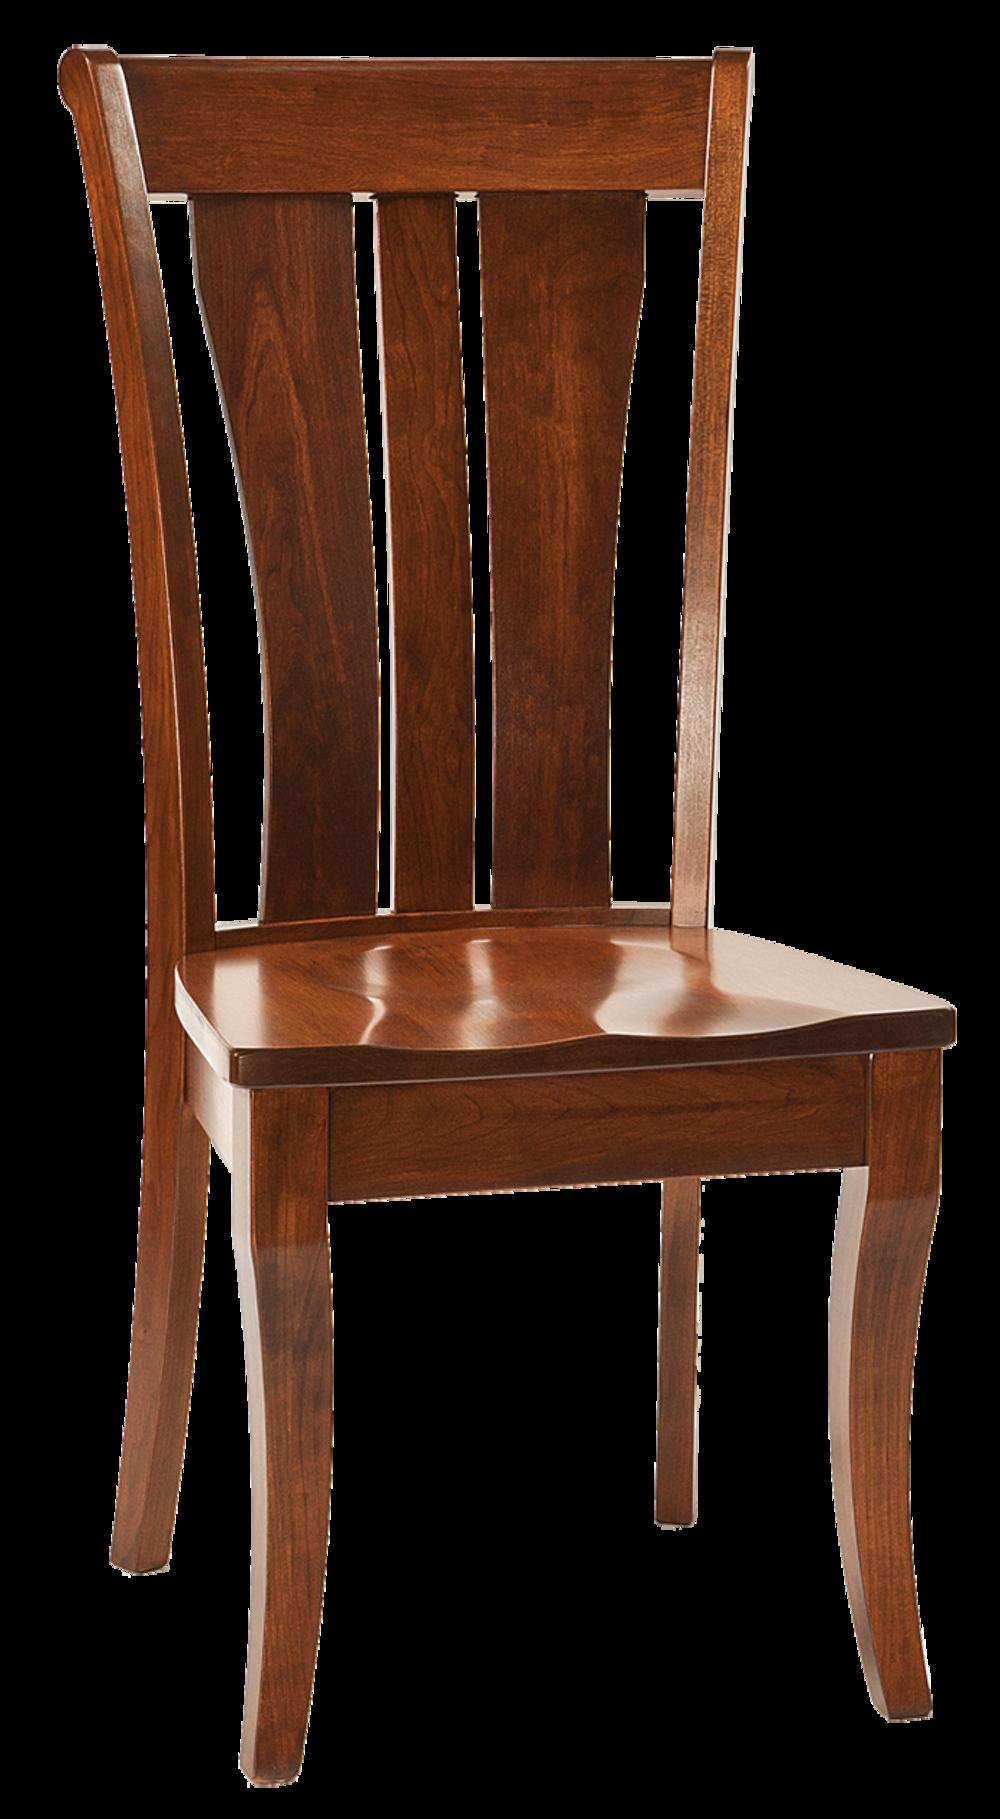 Conrad Grebel - Towson Side Chair